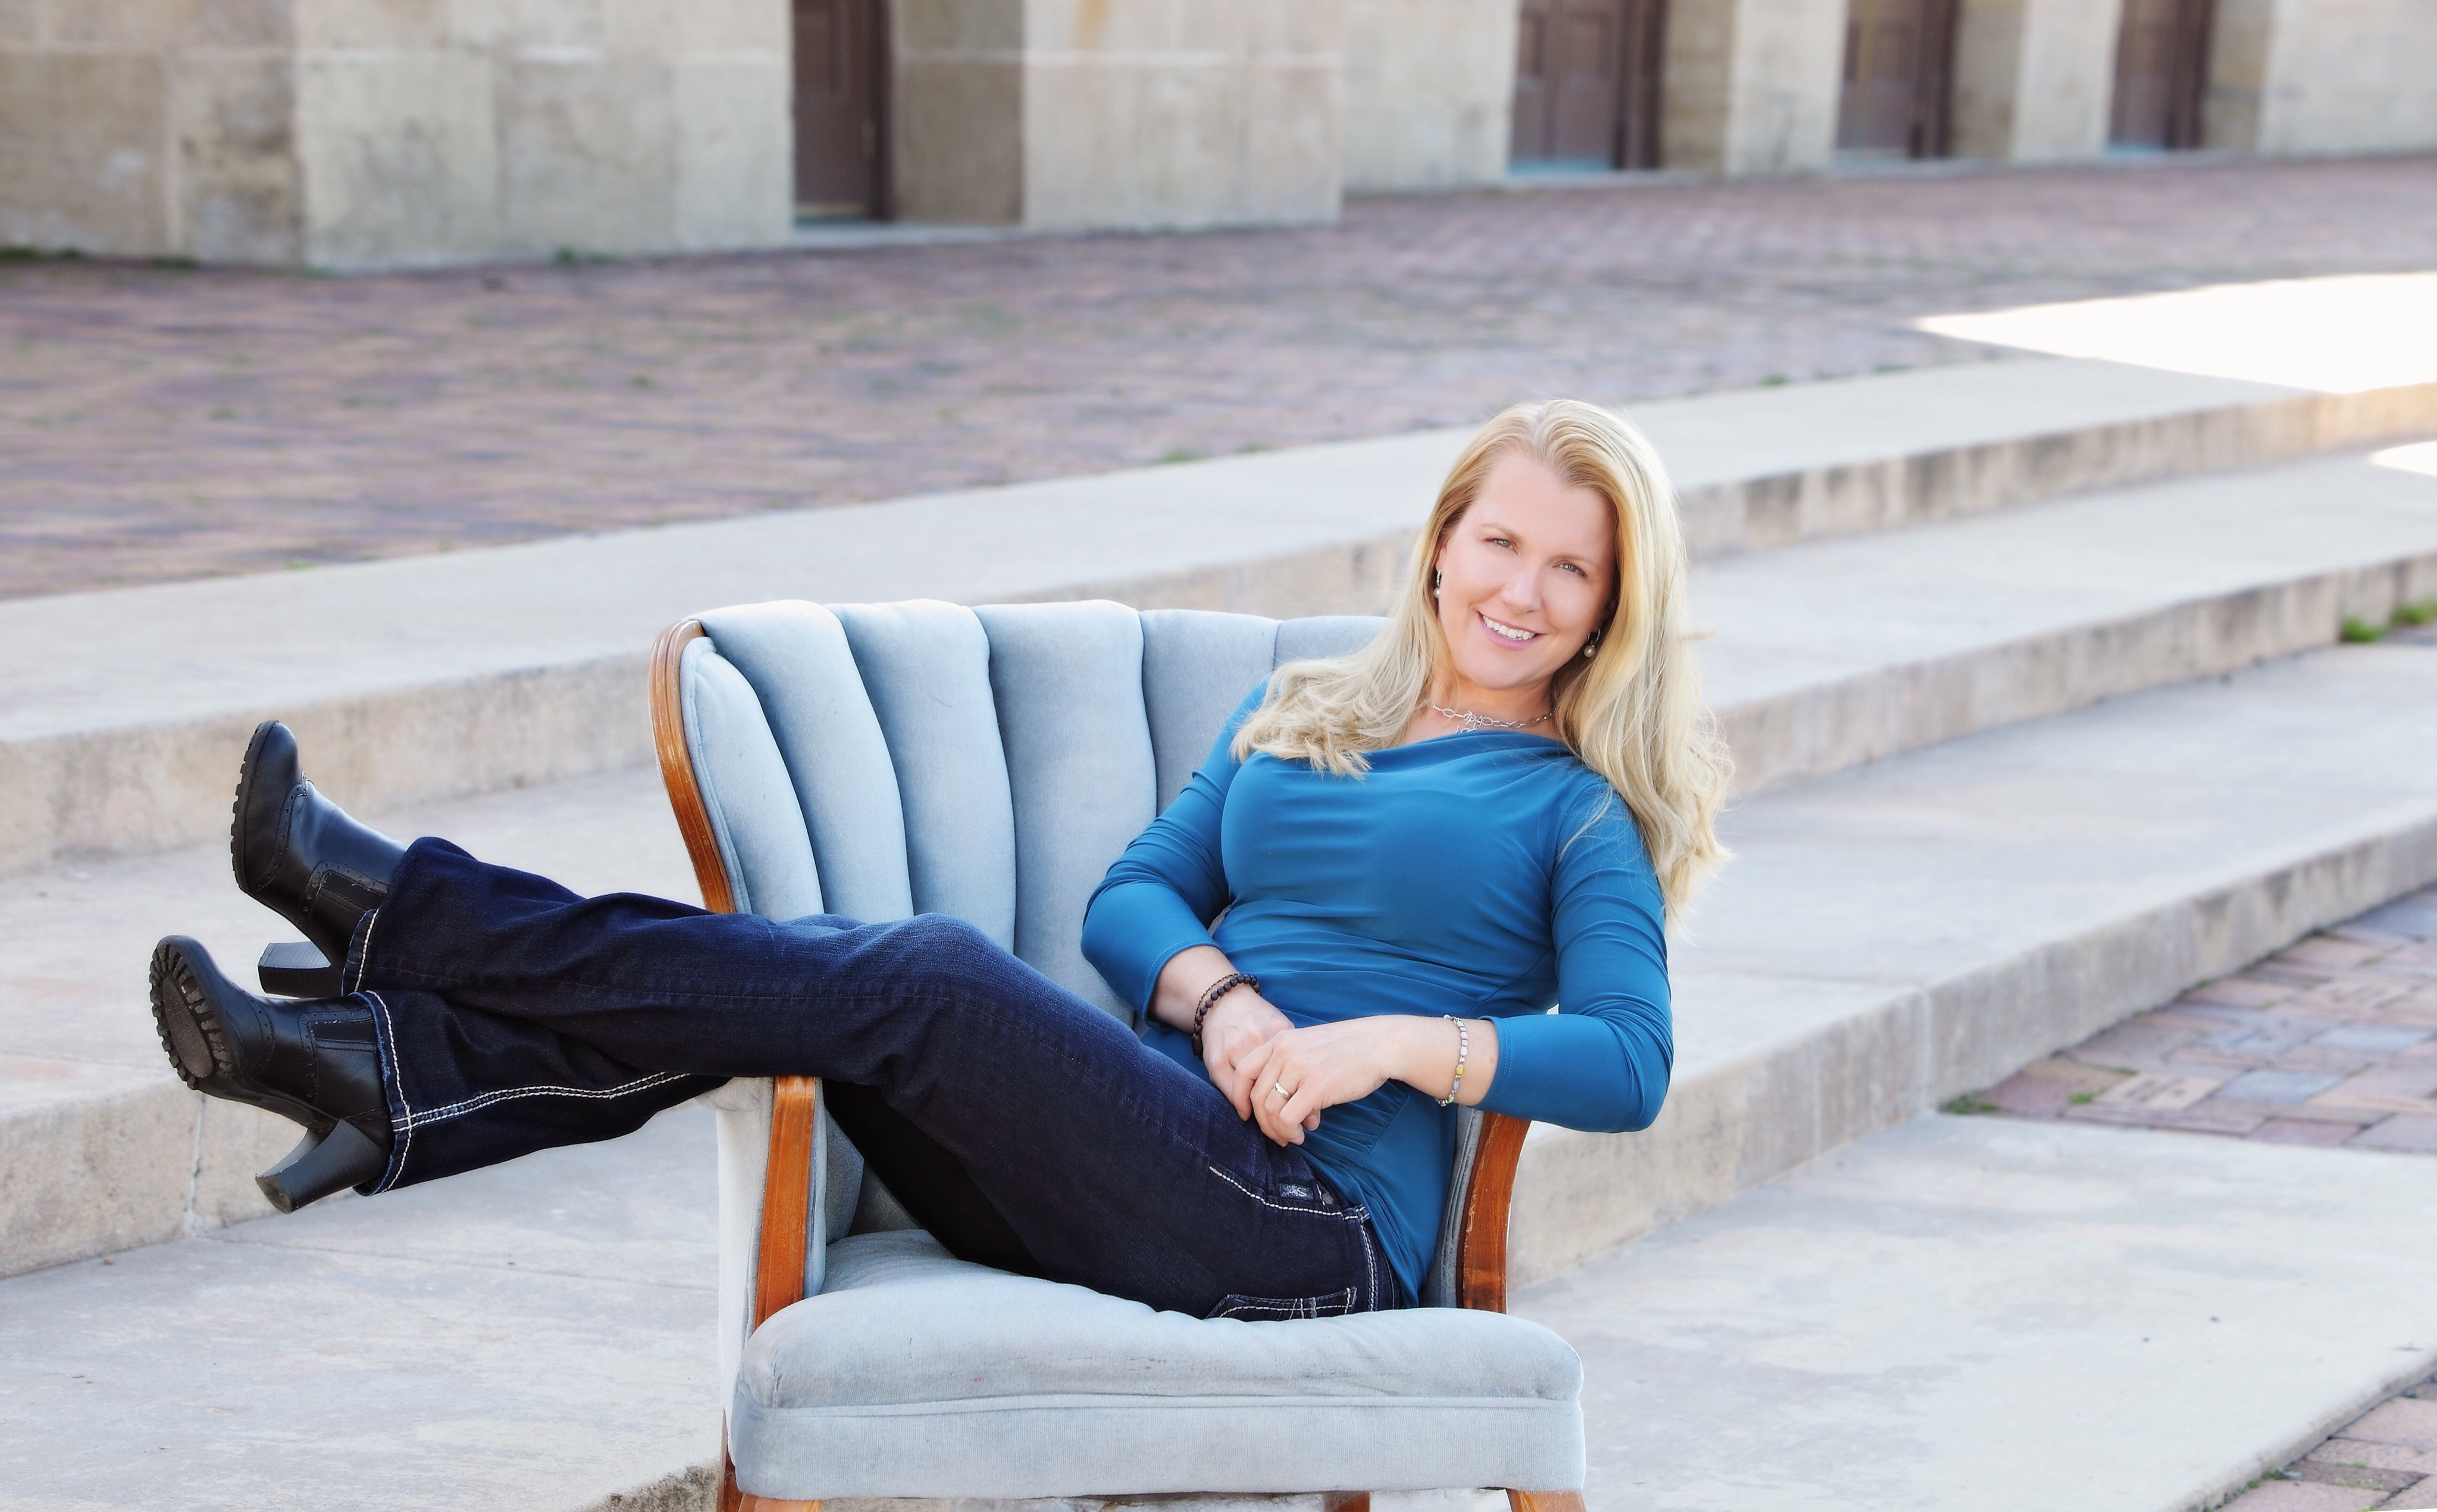 brandi j roberts, artist, writer, author, penn state, eagle magazine, painter,